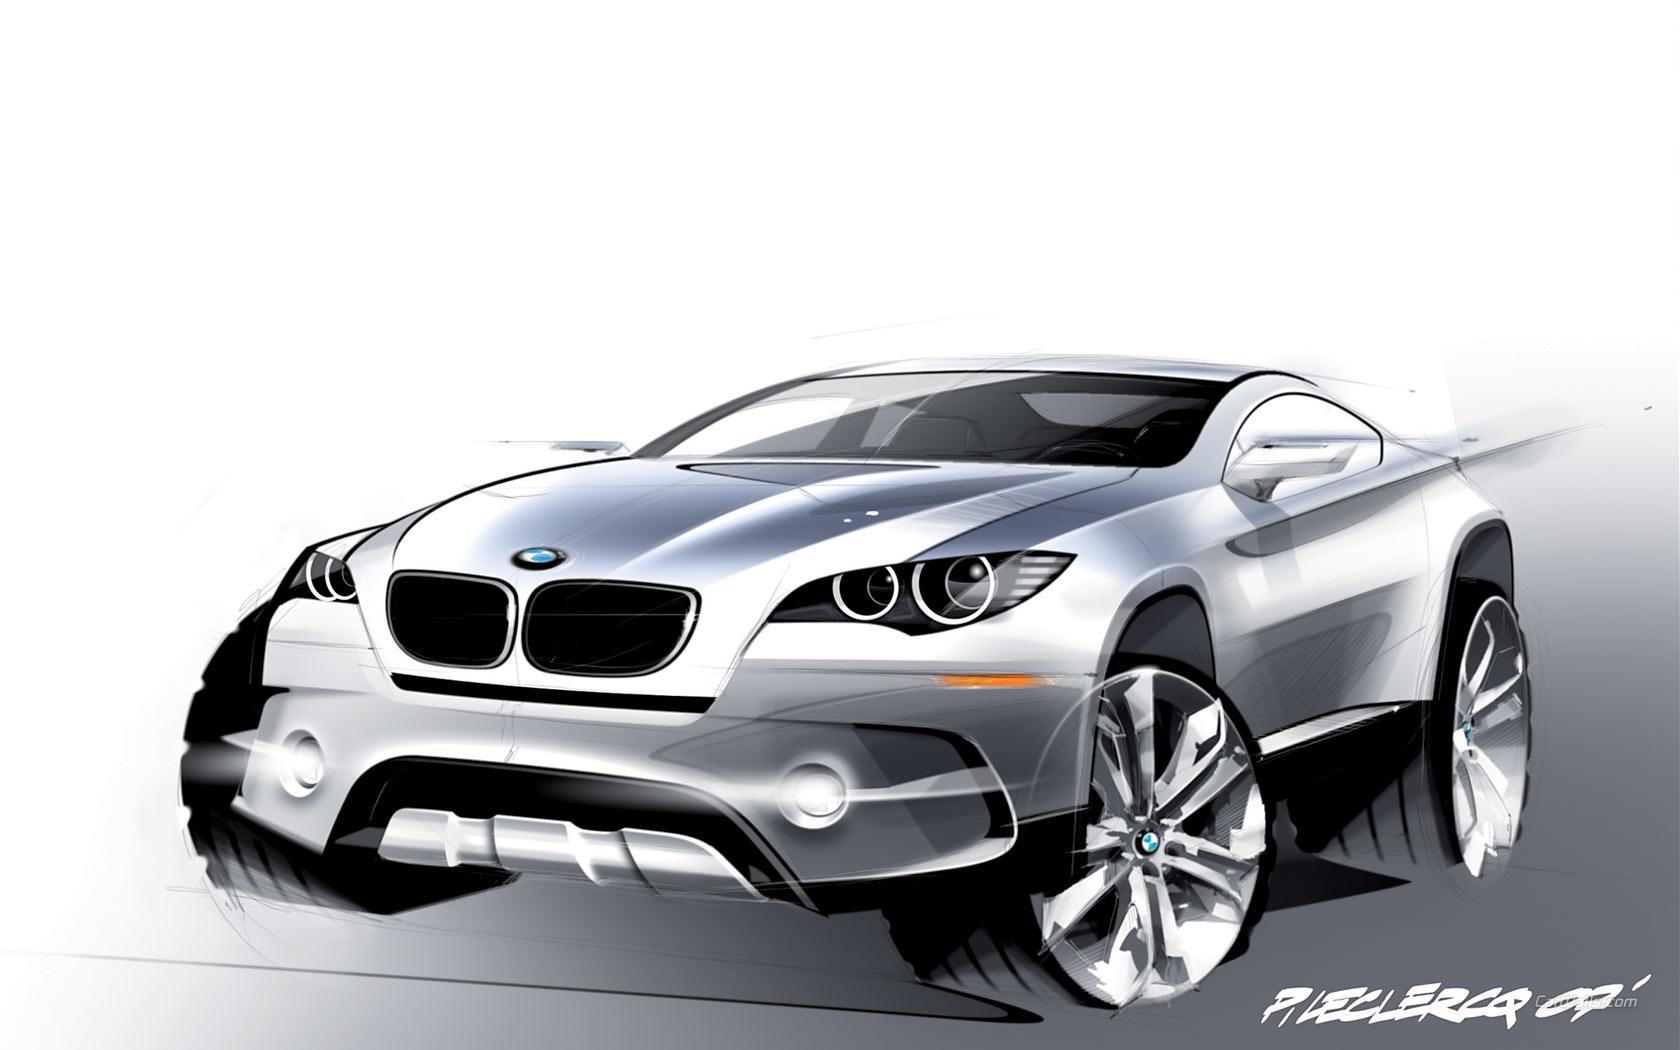 BMW_X6_Concept_16_1680x1050.jpg